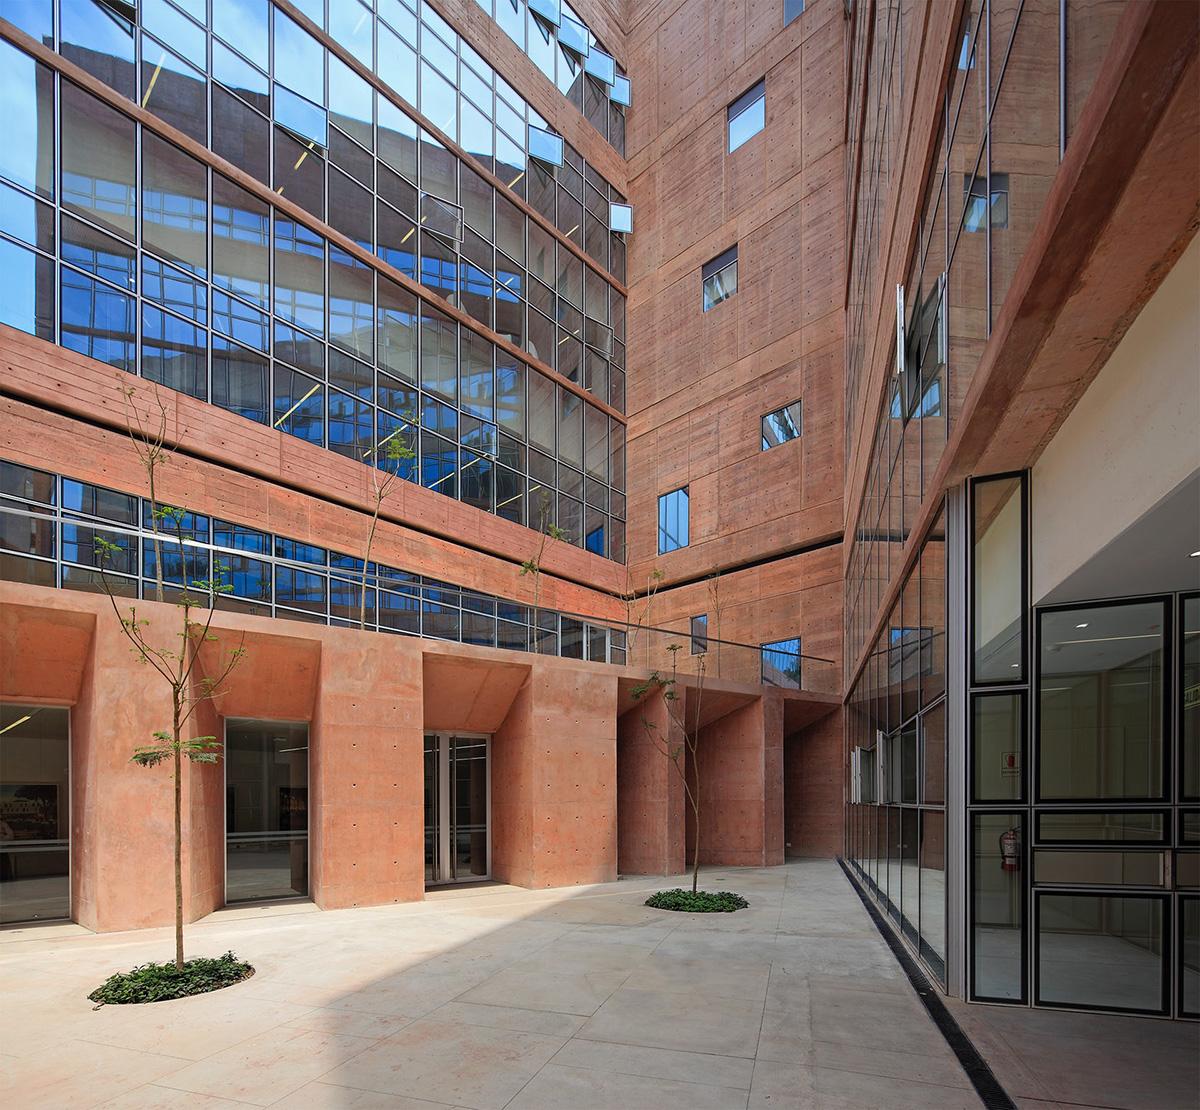 05-biblioteca-ciencias-ingenieria-arquitectura-pucp-foto-juan-solano-ojasi